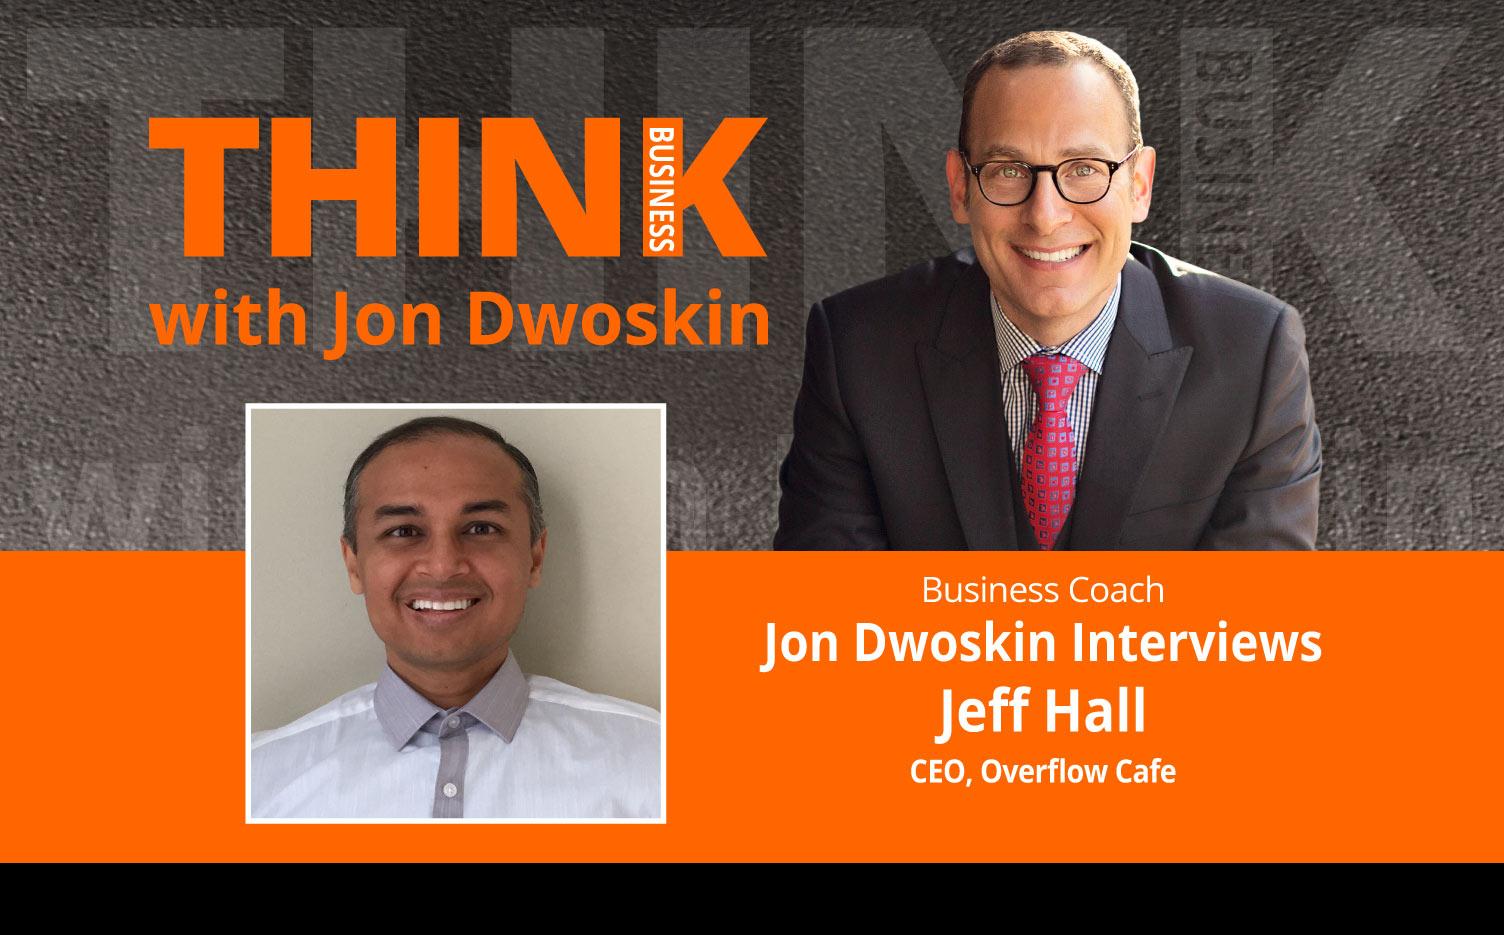 THINK Business Podcast: Jon Dwoskin Interviews Jeff Hall, CEO, Overflow Cafe